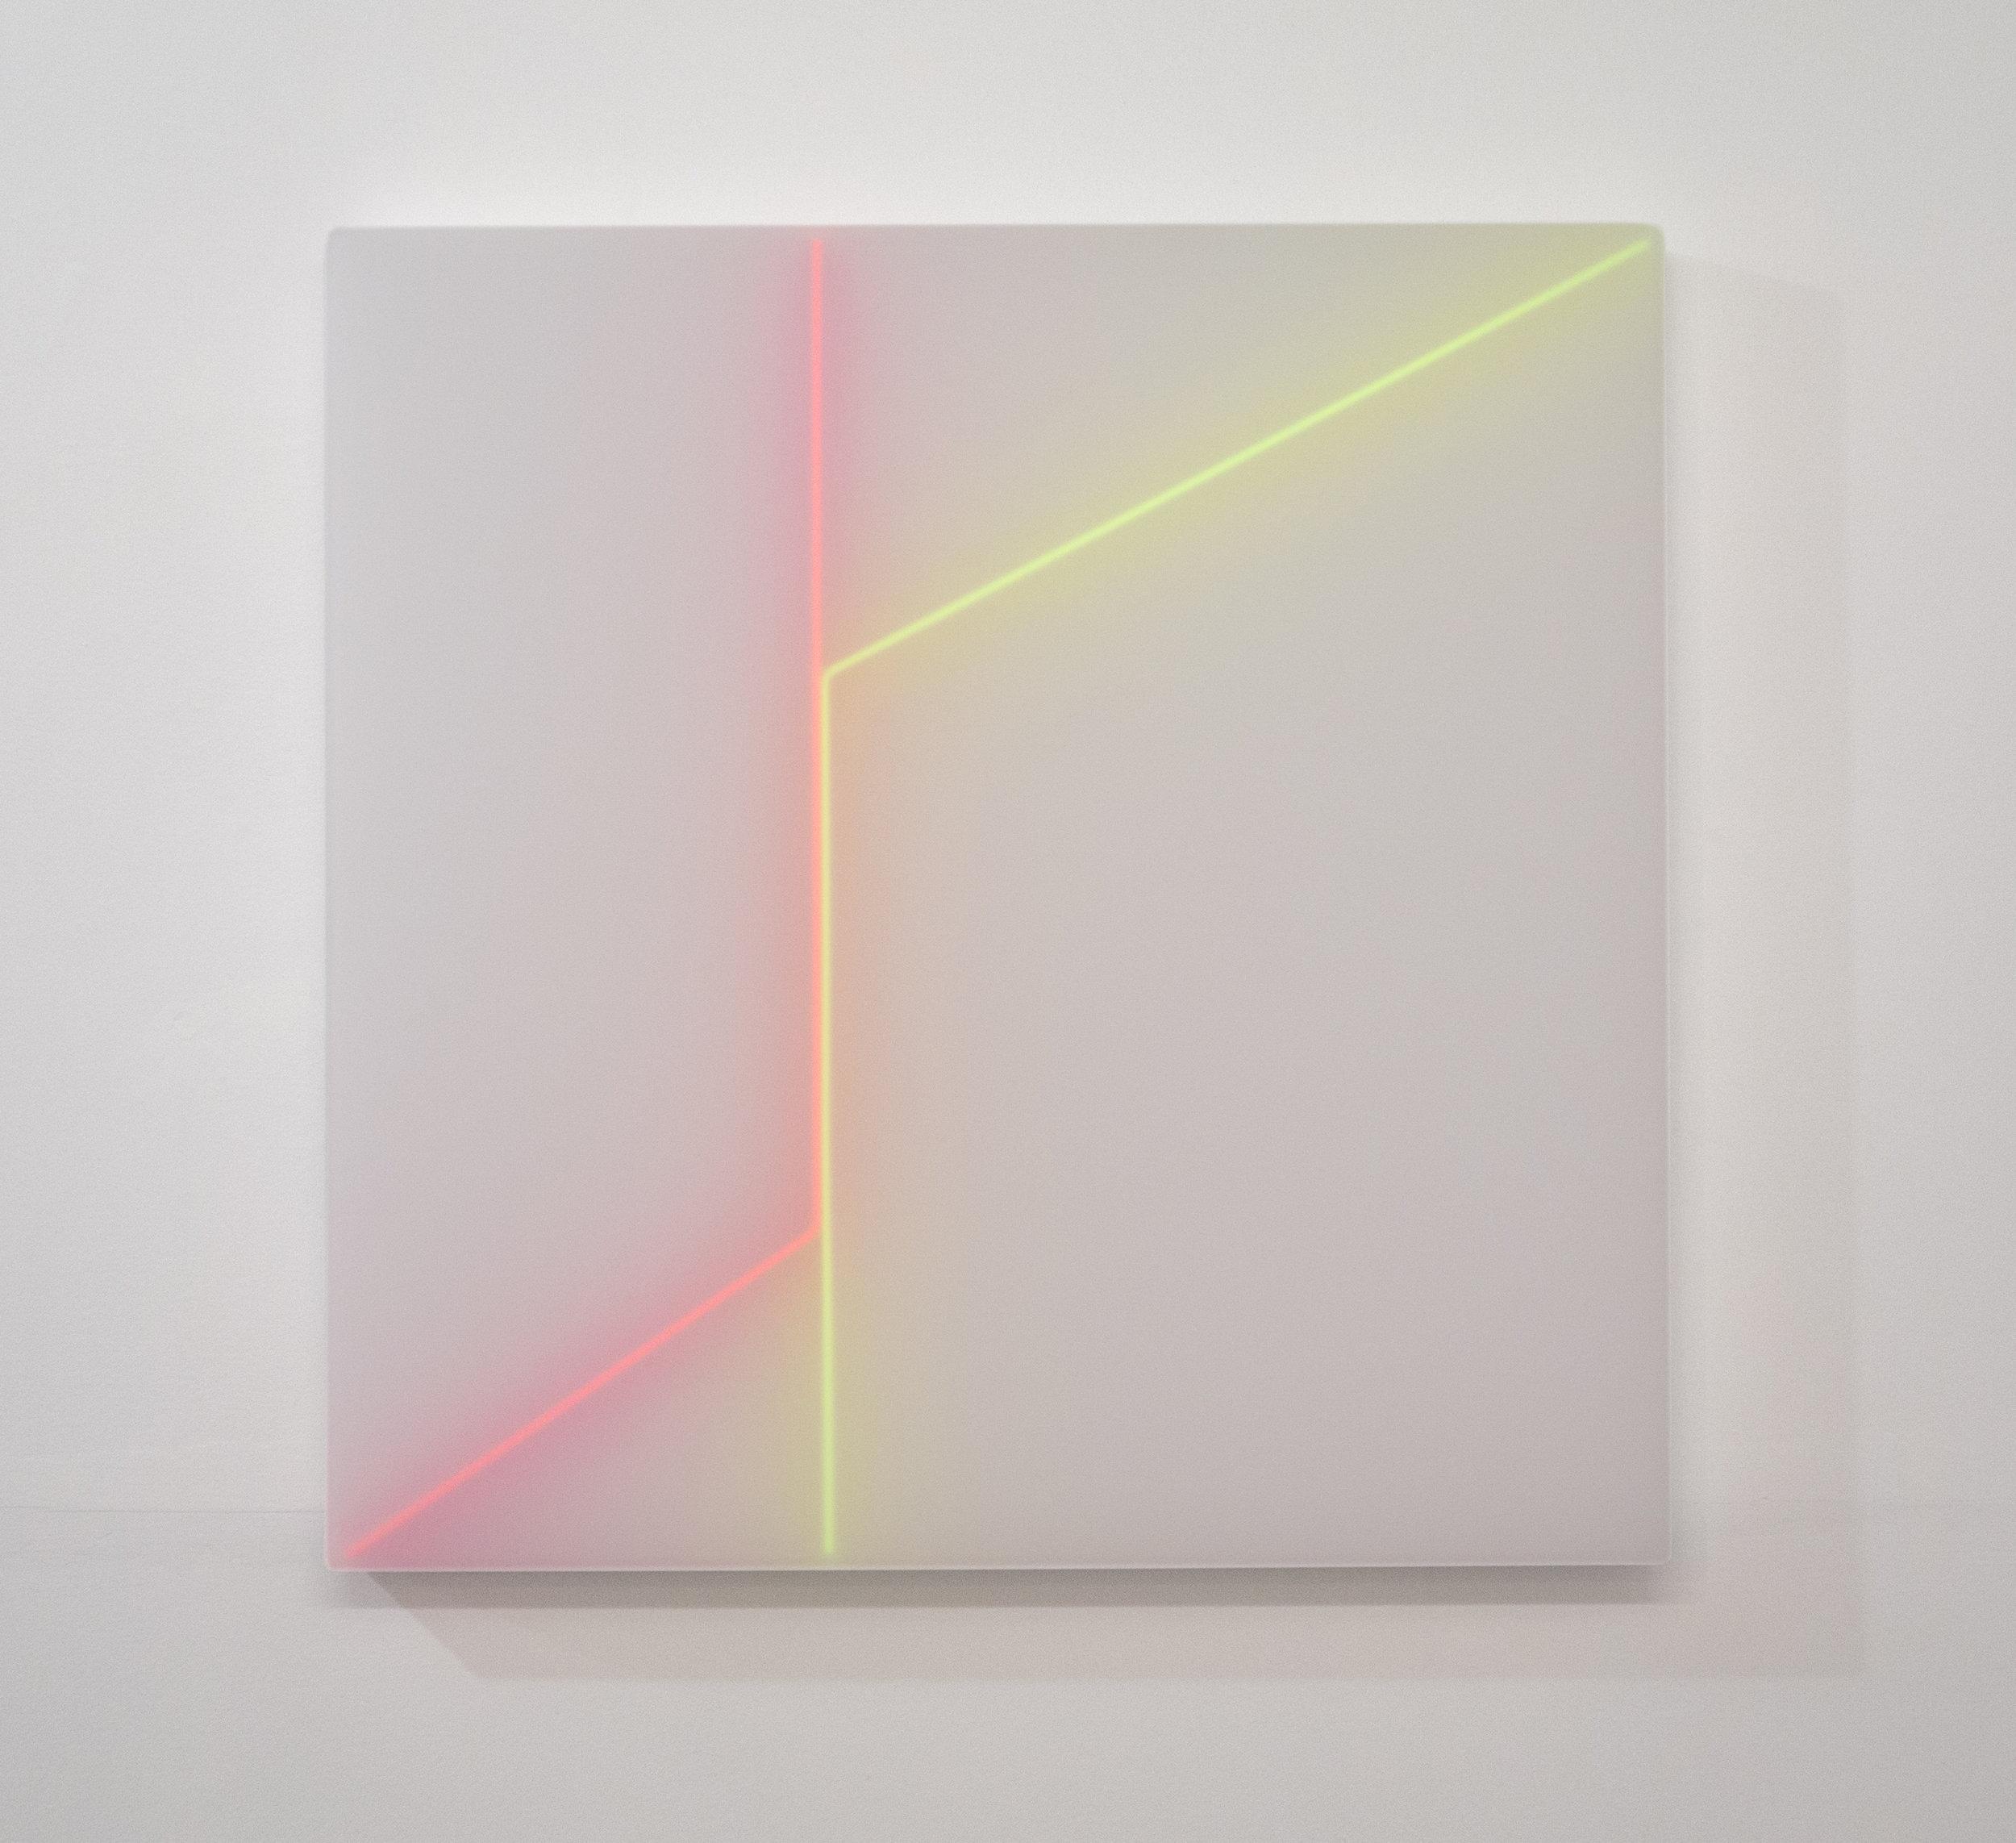 Karyn Taylor, Transition Point, 2017, cast acrylic, 60 x 60 x 5cm.jpg